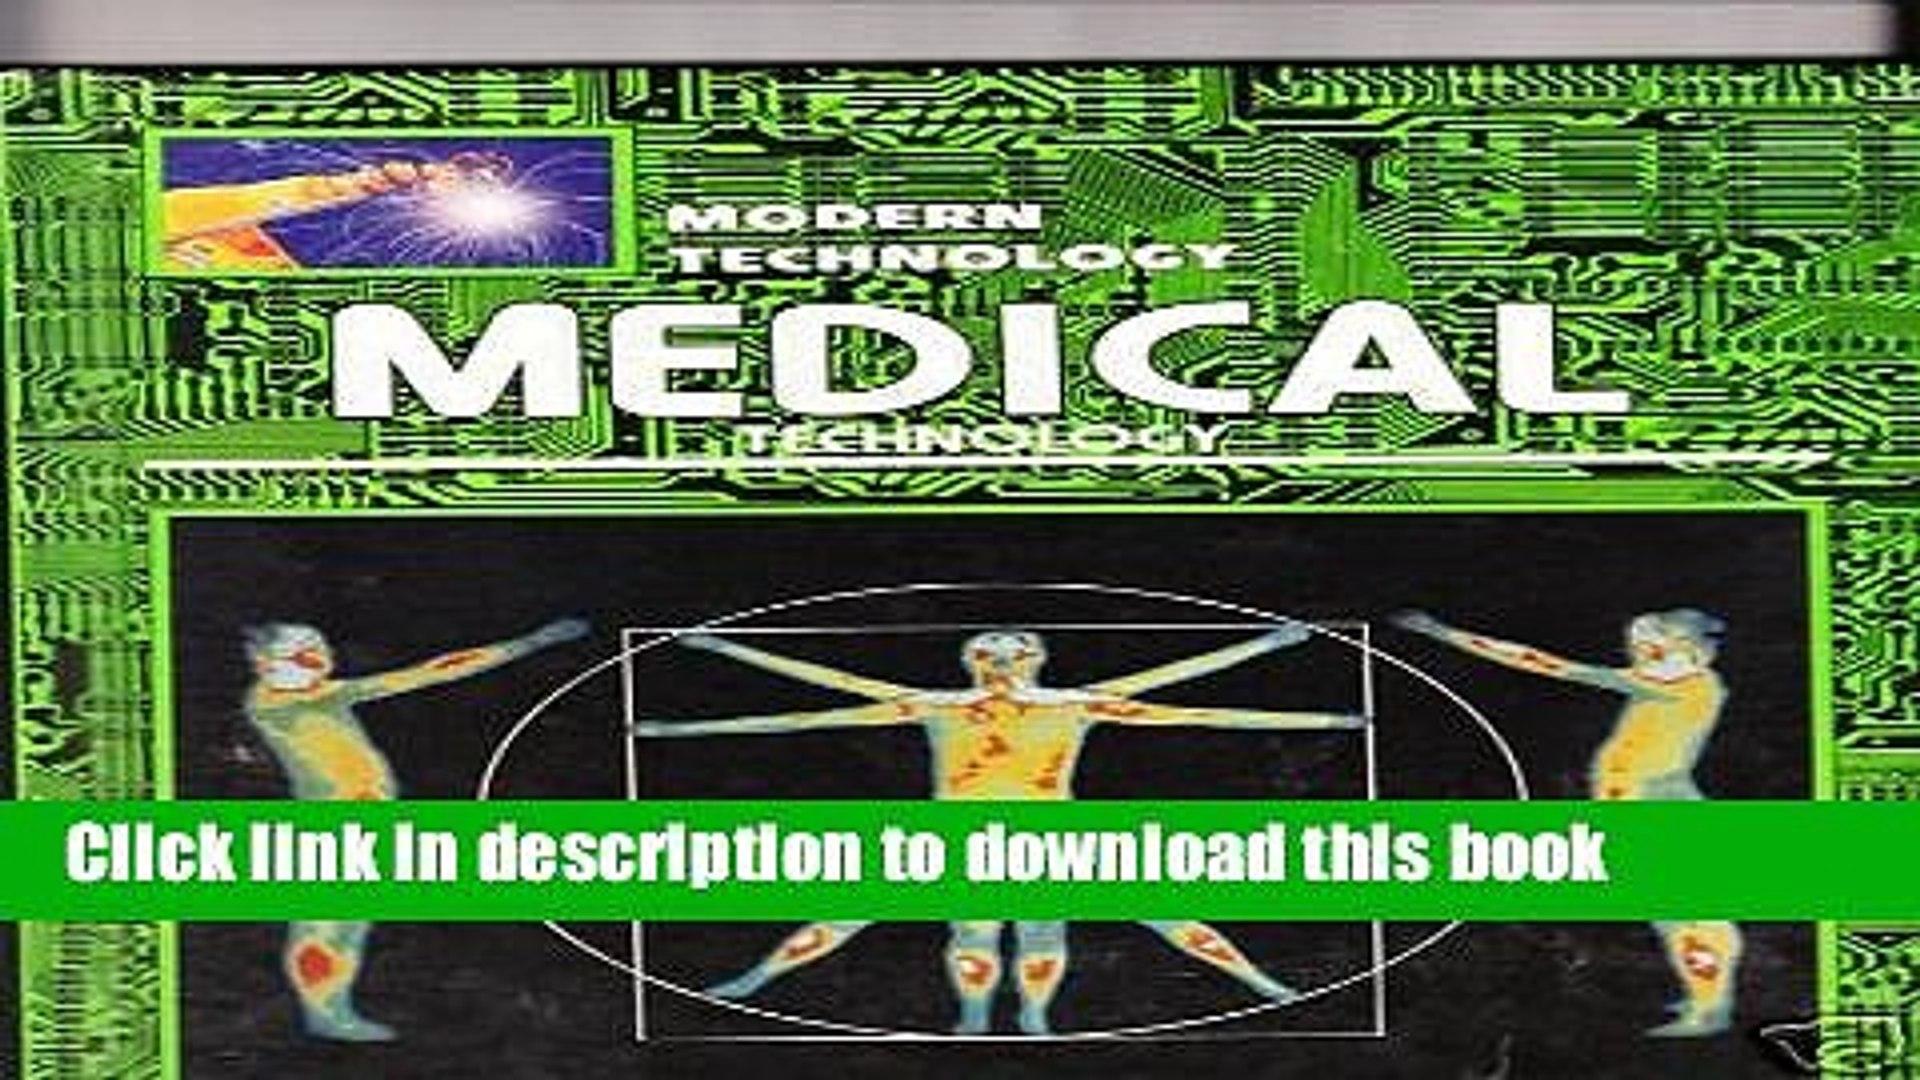 Books Medical technology (Modern technology) Free Online